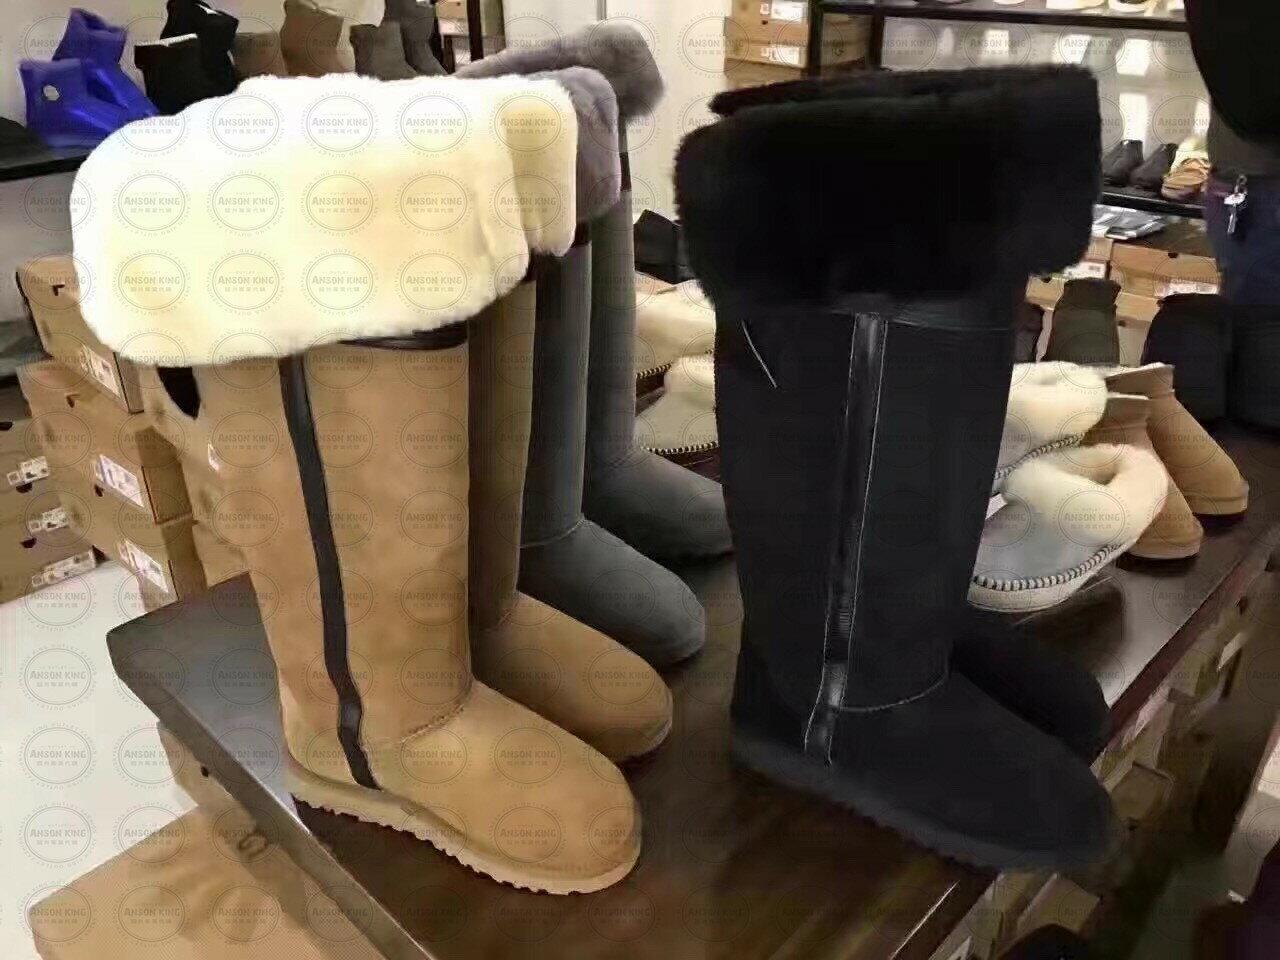 OUTLET正品代購 澳洲 UGG 千頌伊同款過膝羊皮毛雪靴 保暖 真皮羊皮毛 雪靴 短靴 駝色 3